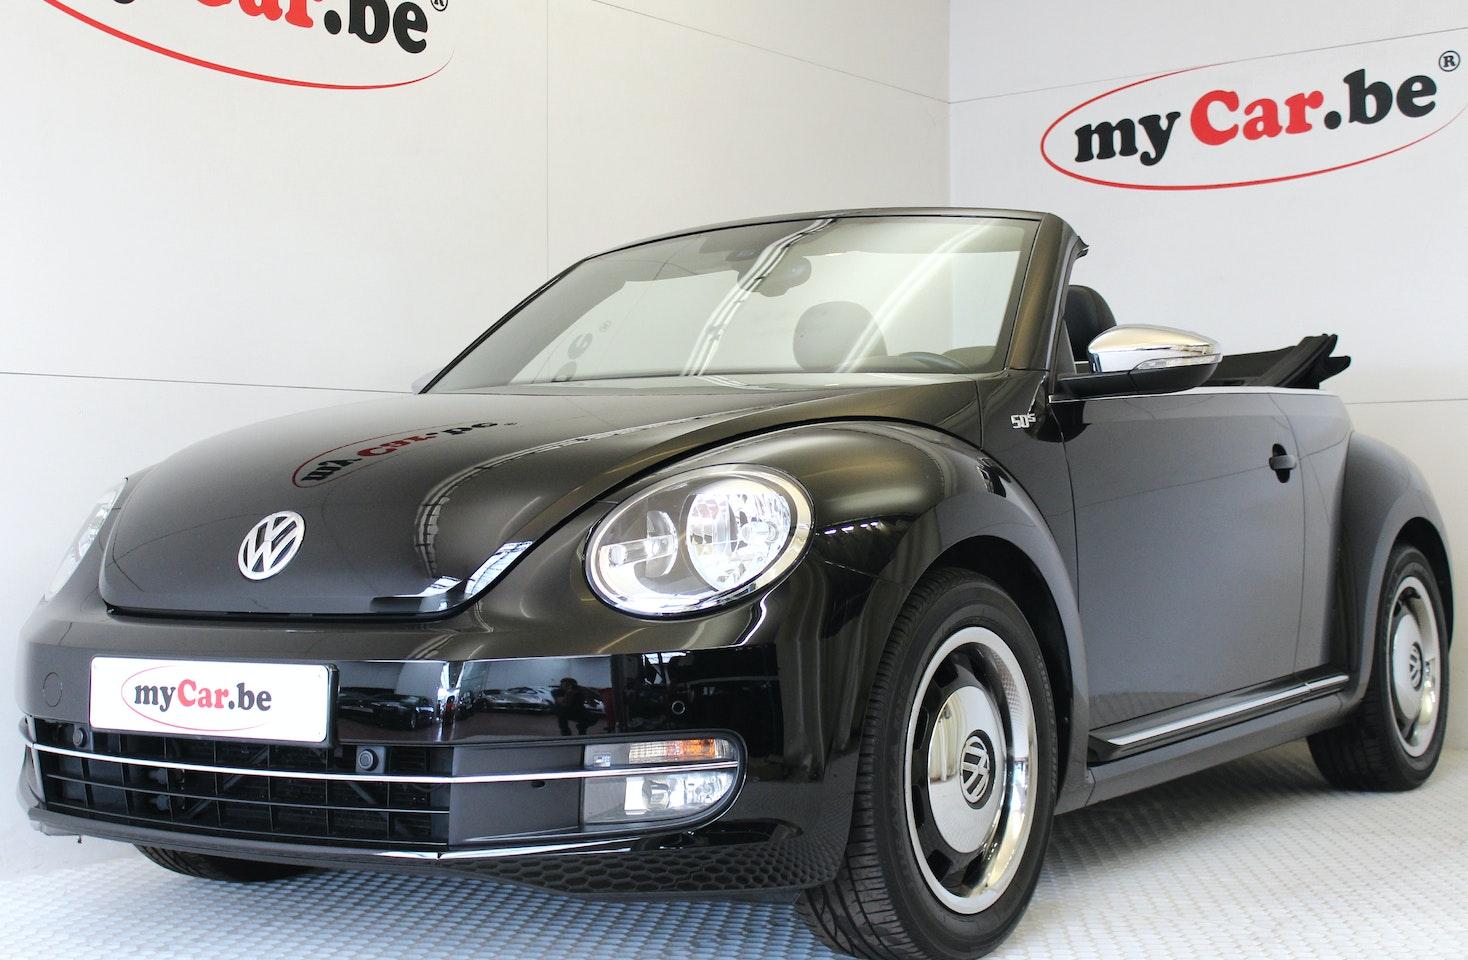 volkswagen new beetle cabriolet 50s edition le sp cialiste dans presque. Black Bedroom Furniture Sets. Home Design Ideas